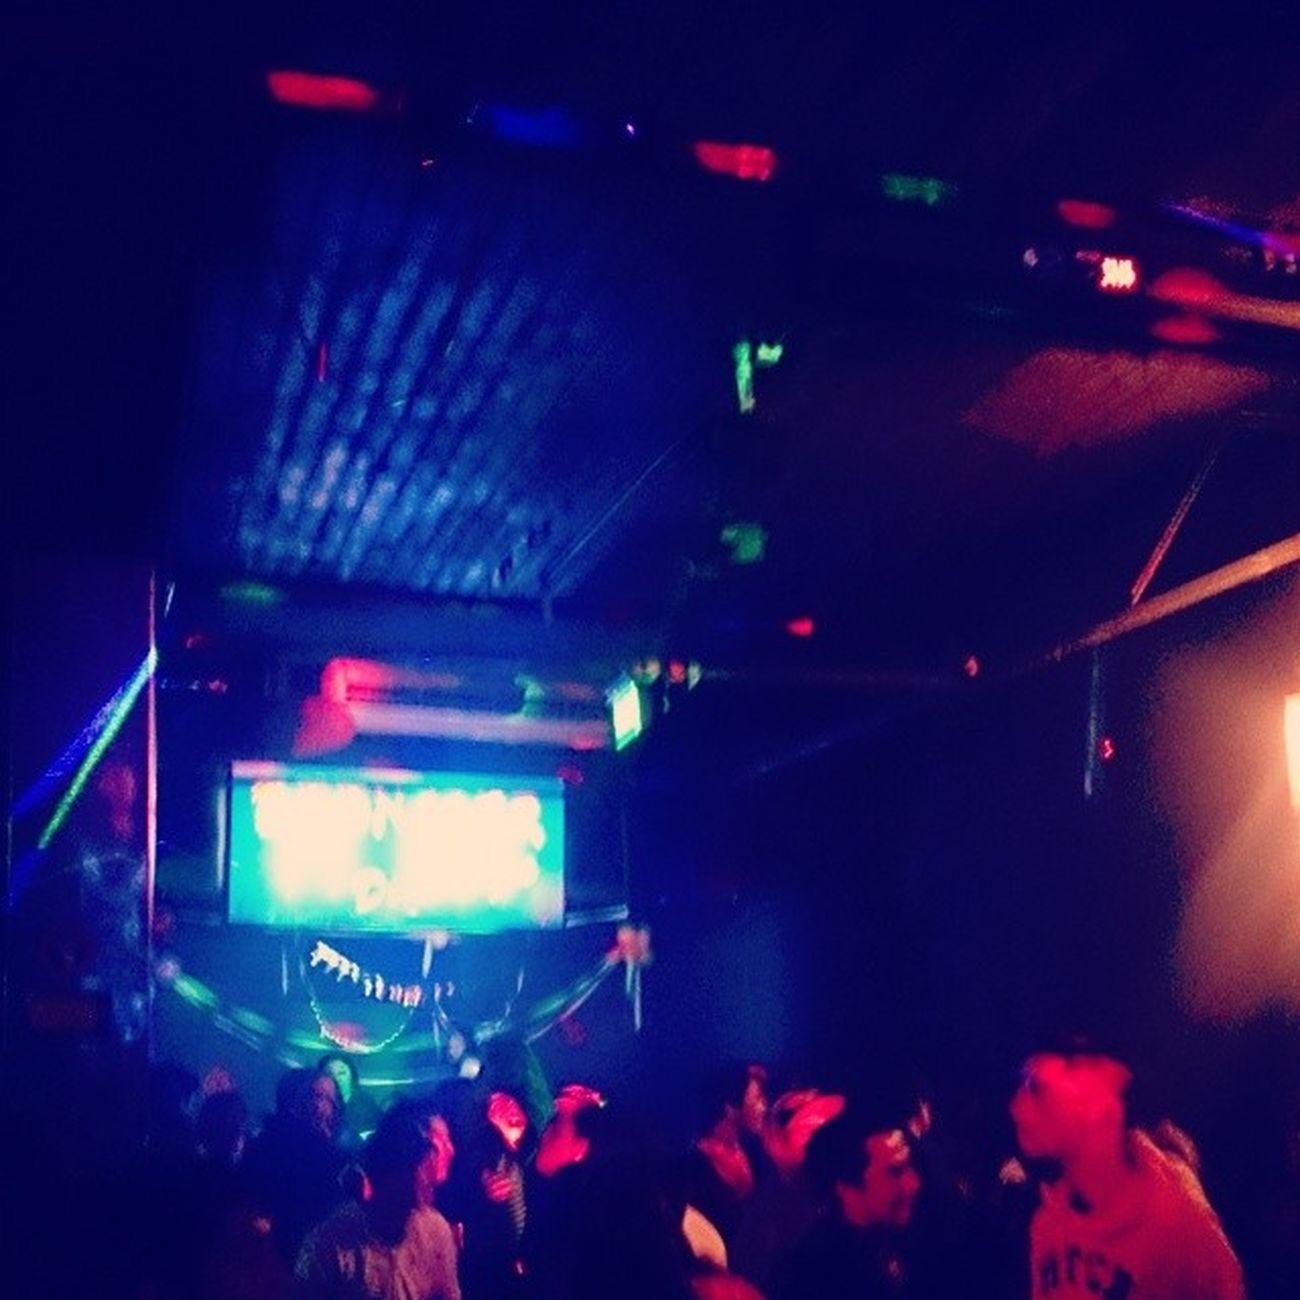 Su boonsterazoooo Ajajaj a lo vioooo Instachile Instaphoto Partyup Party night disco choroforlife